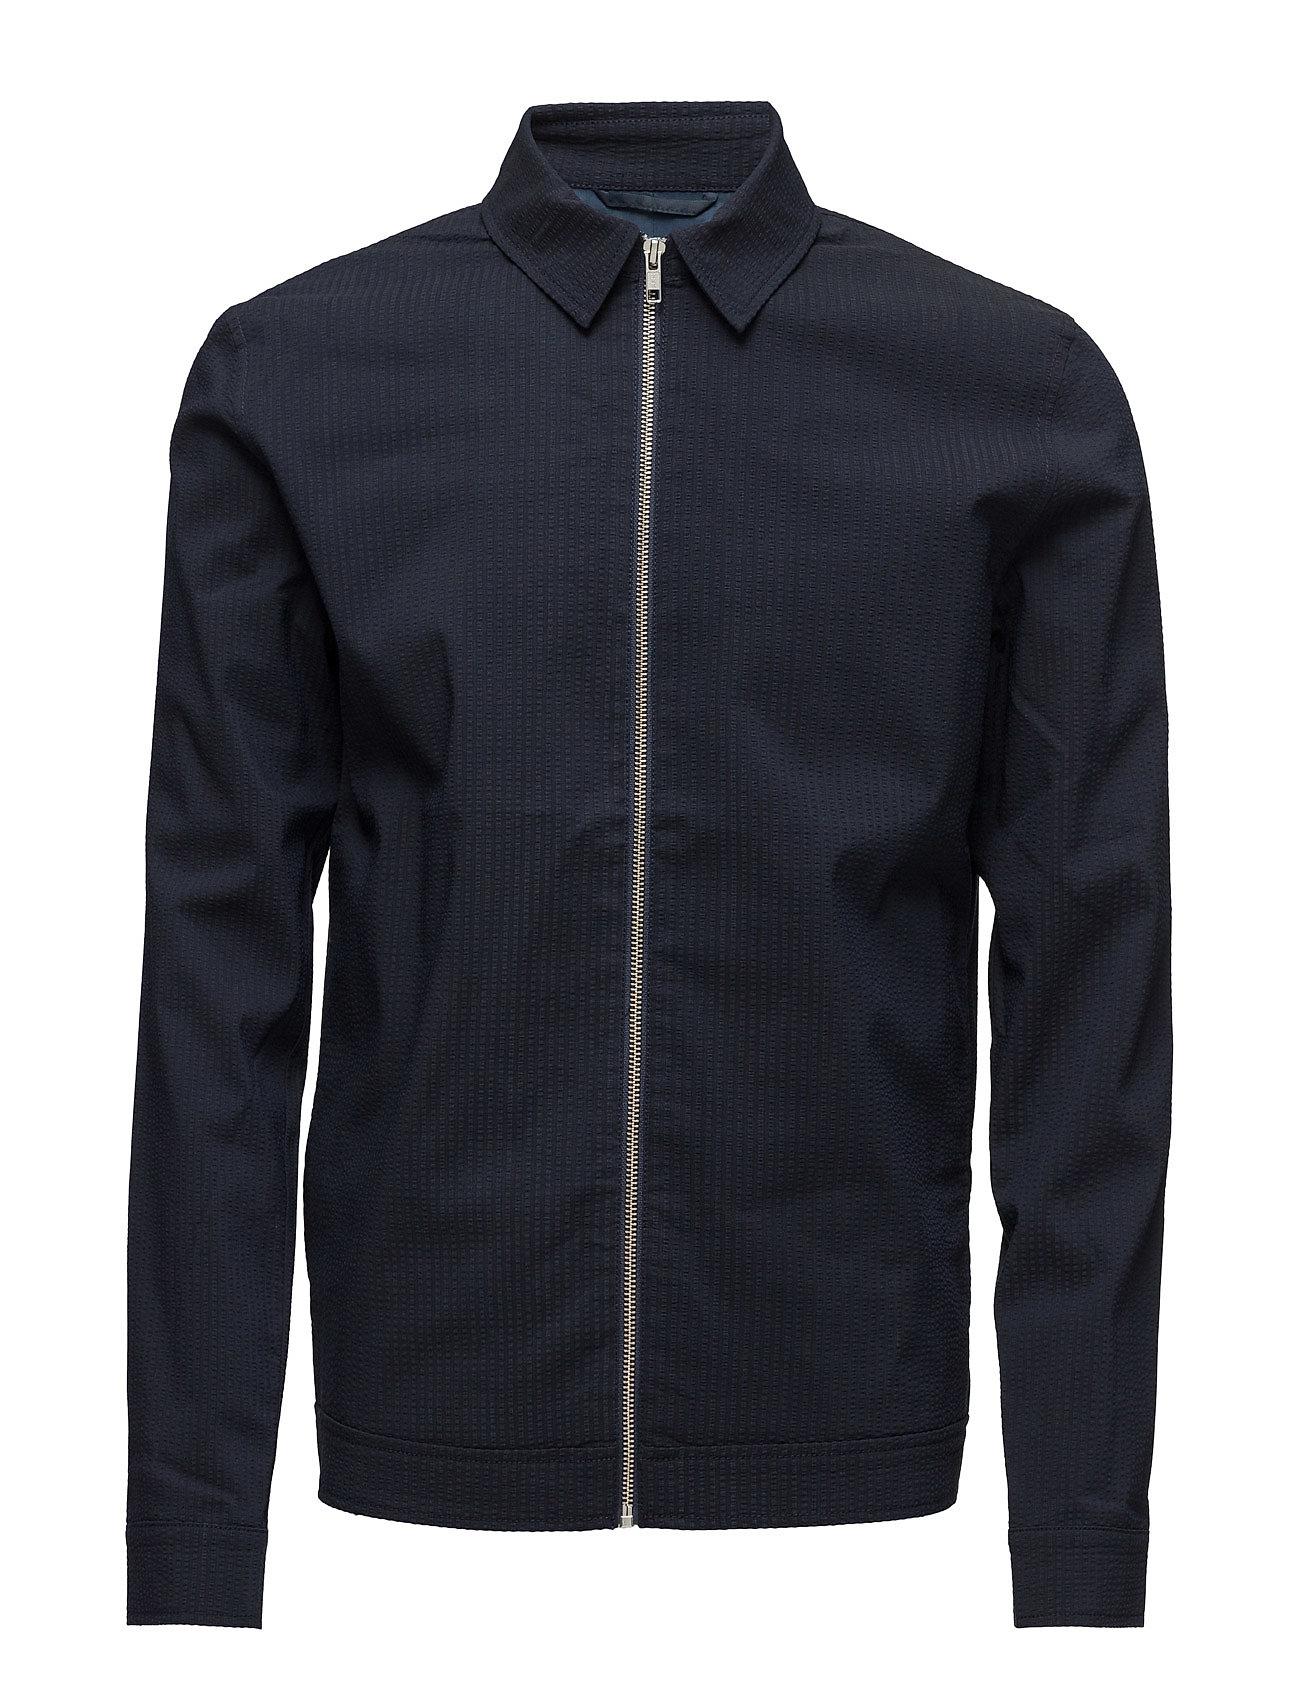 samsã¸e & samsã¸e Gilbert jacket 7990 fra boozt.com dk